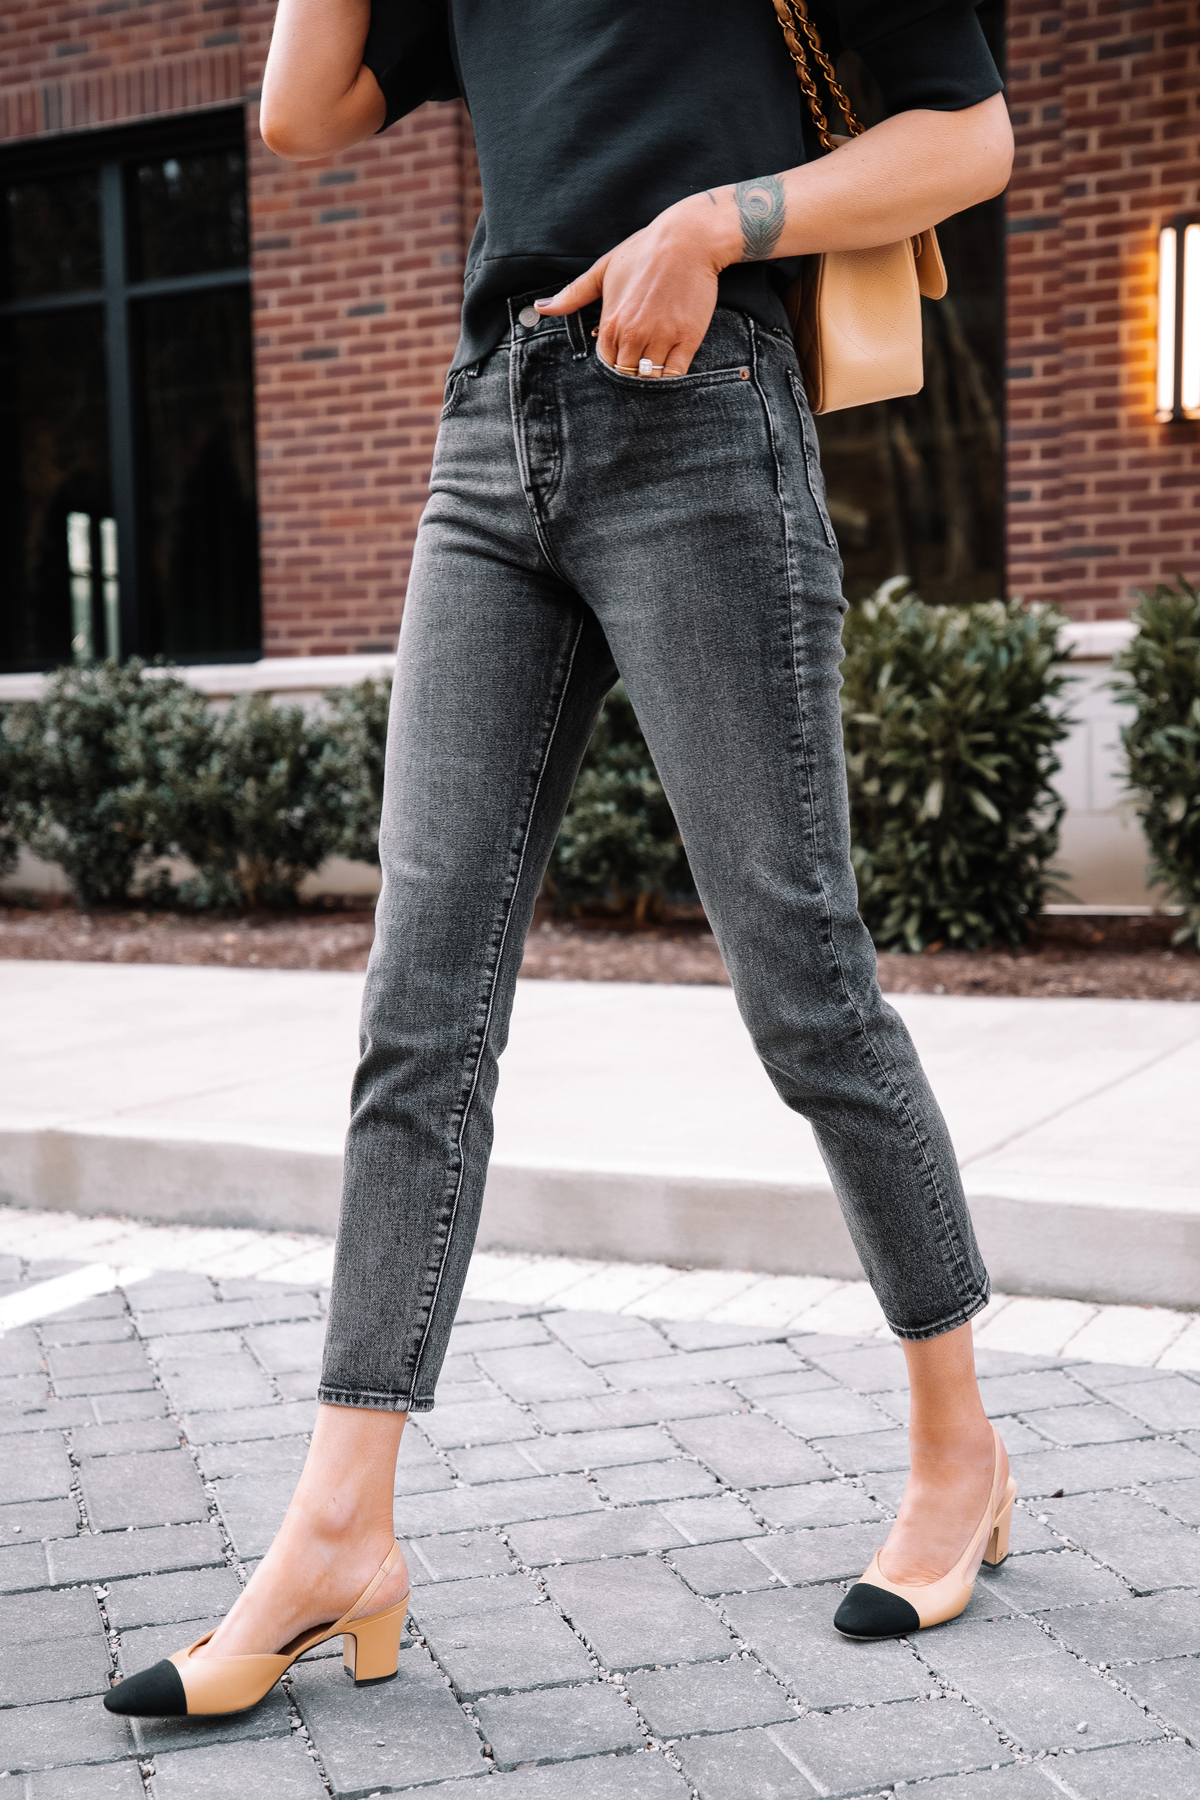 Fashion Jackson Wearing Navy Short Sleeve Sweatshirt Levis Wedgie Black Jeans Chanel Slingbacks